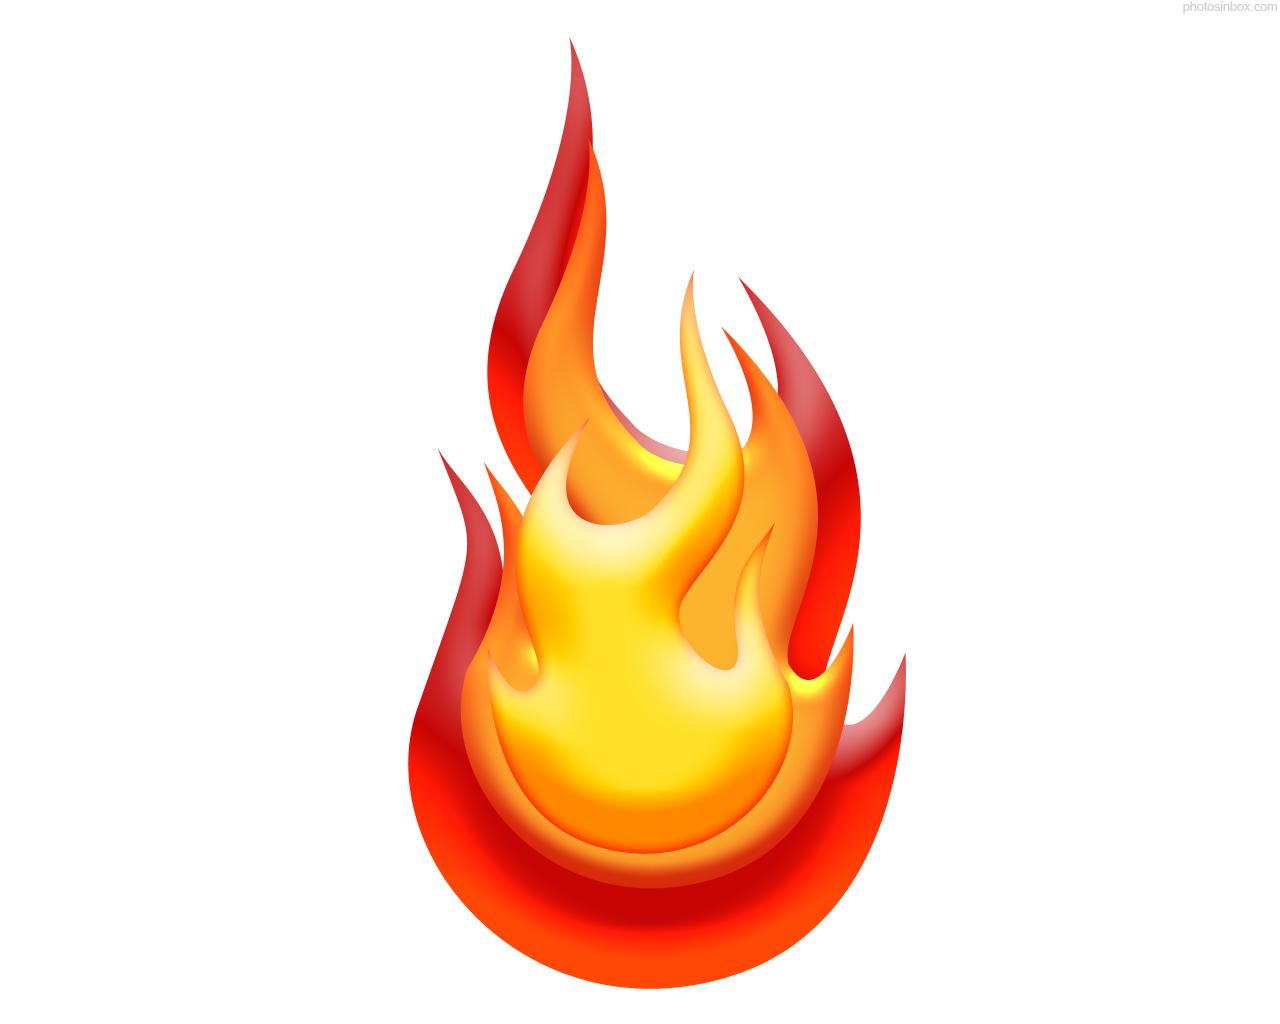 Garena free fire best survival battle royale on. Clipart Panda - Free Clipart Images